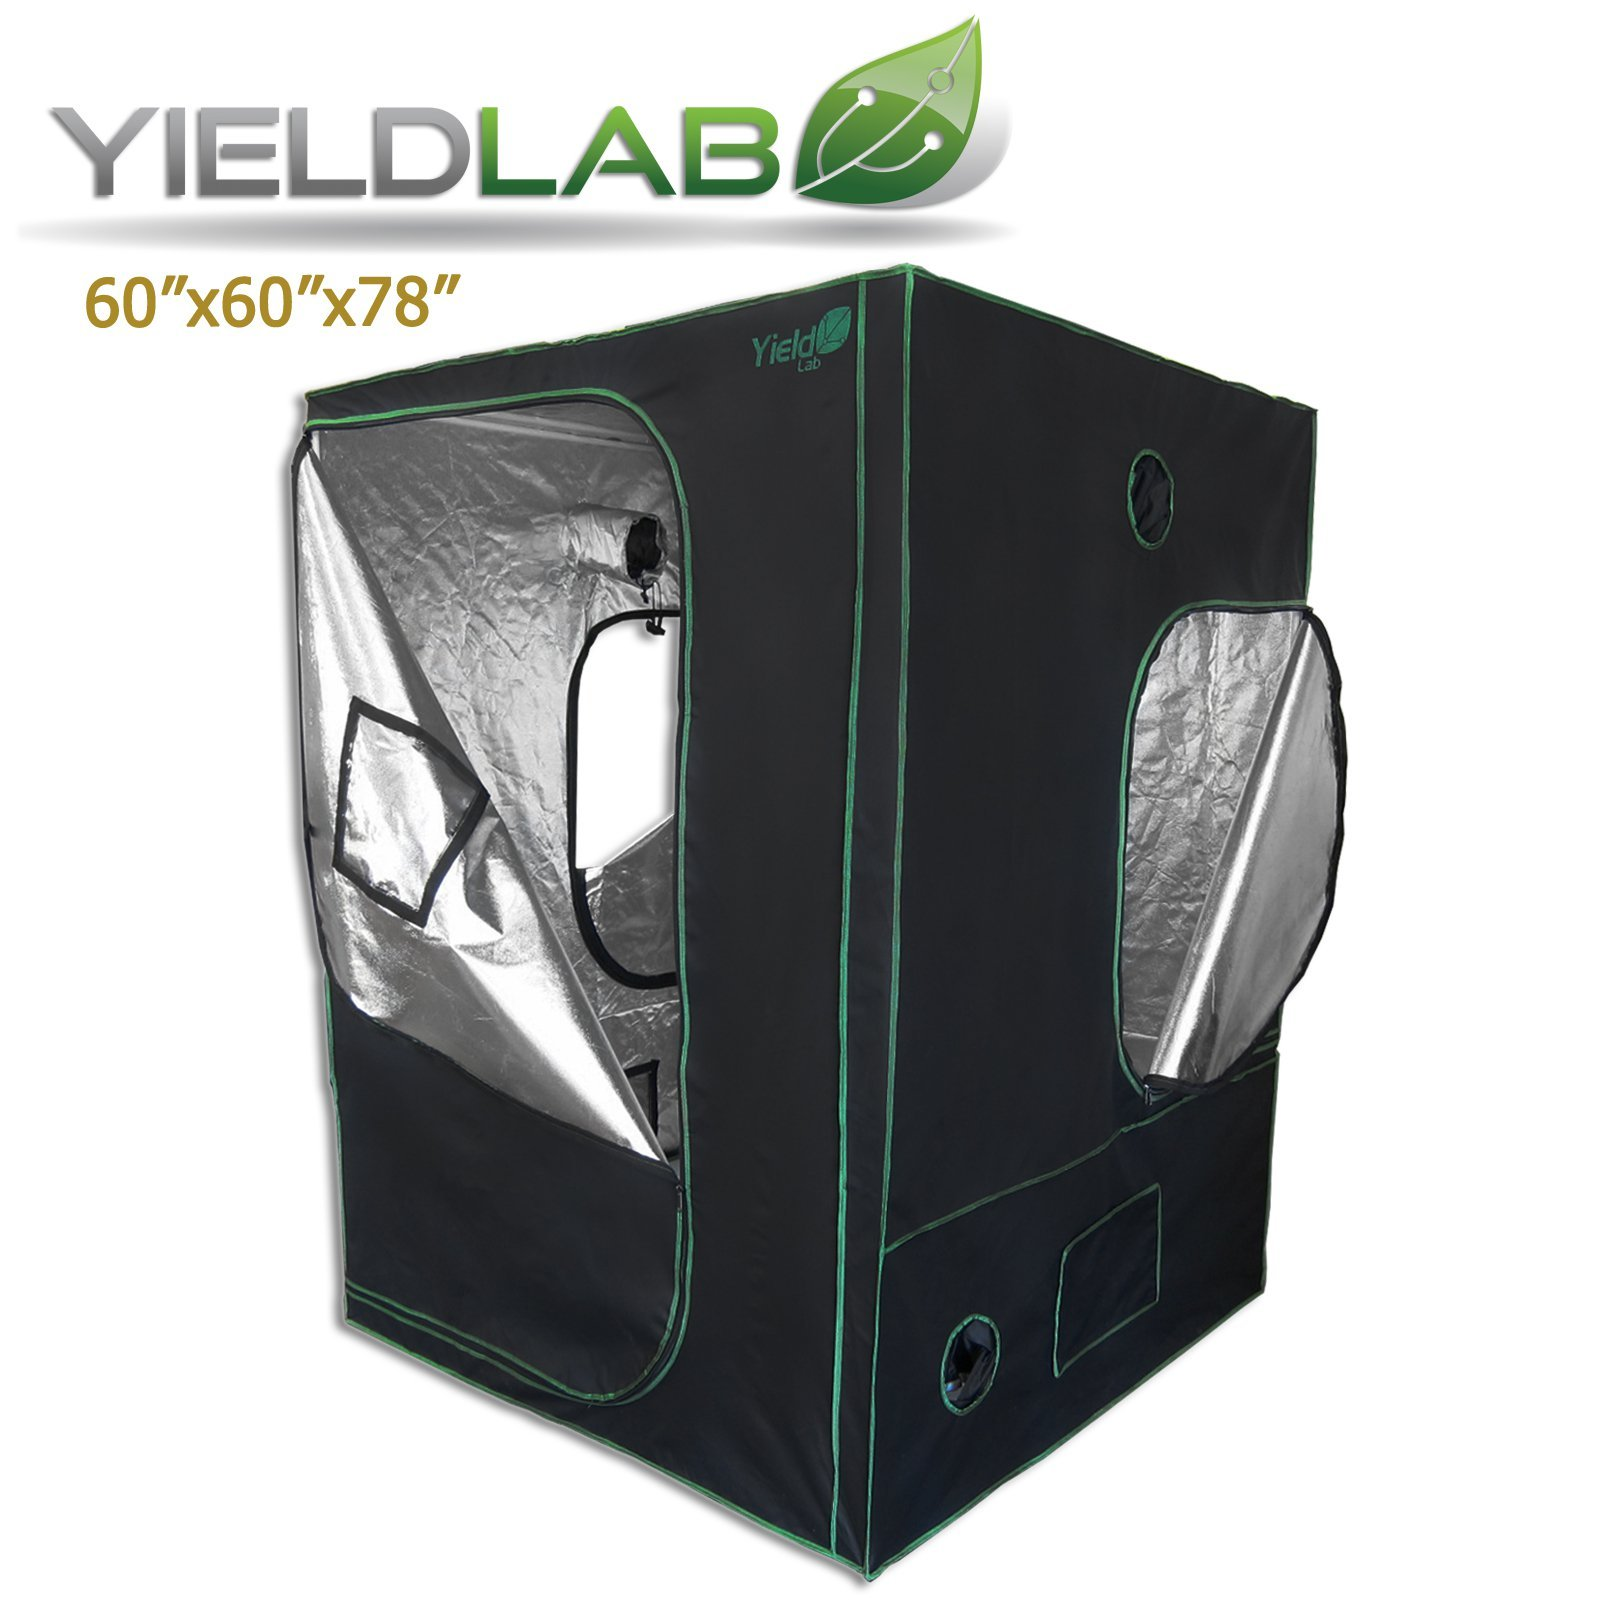 Yield Lab 60x60x78 Inch Grow Tent 100% Reflective Mylar Hydroponic Lightproof Greenhouse